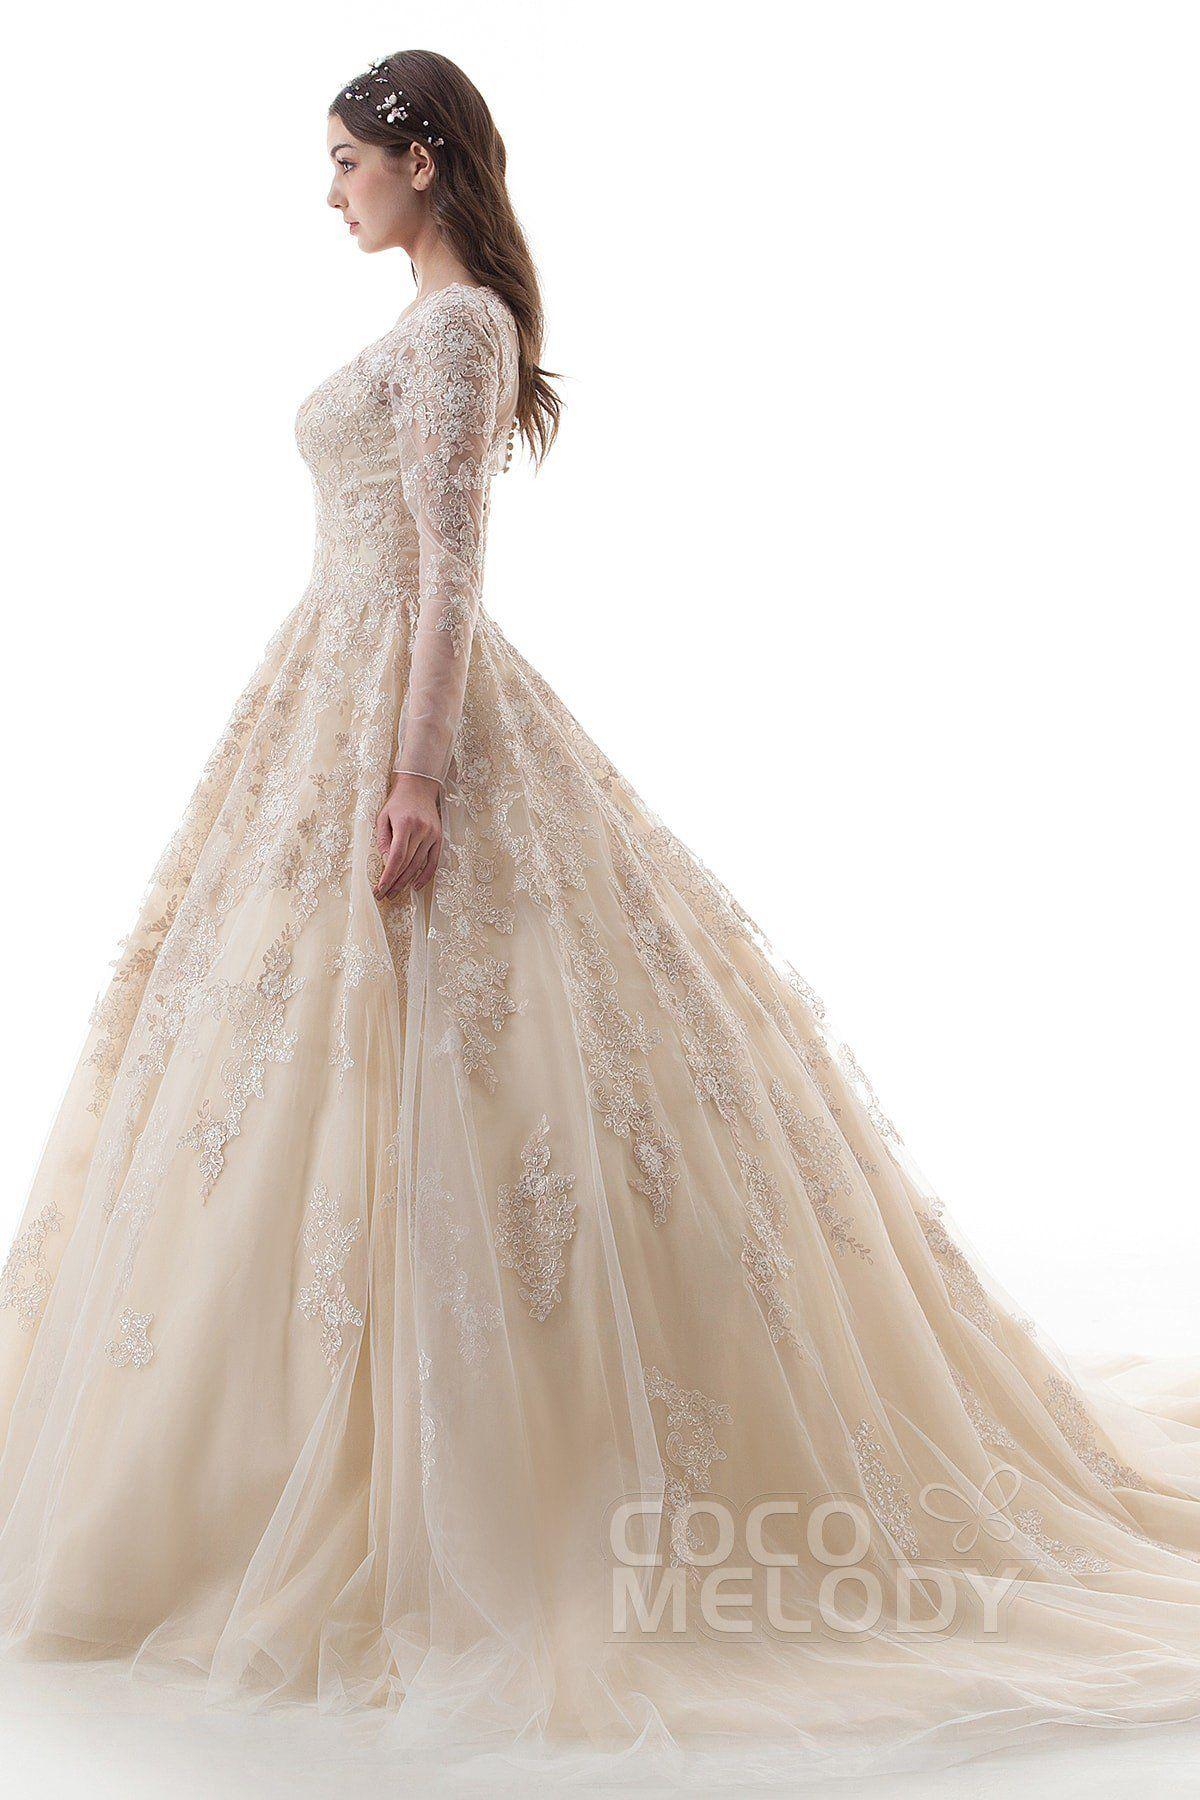 Princess Court Train Lace Tulle Gothic Wedding Dress Ld4622